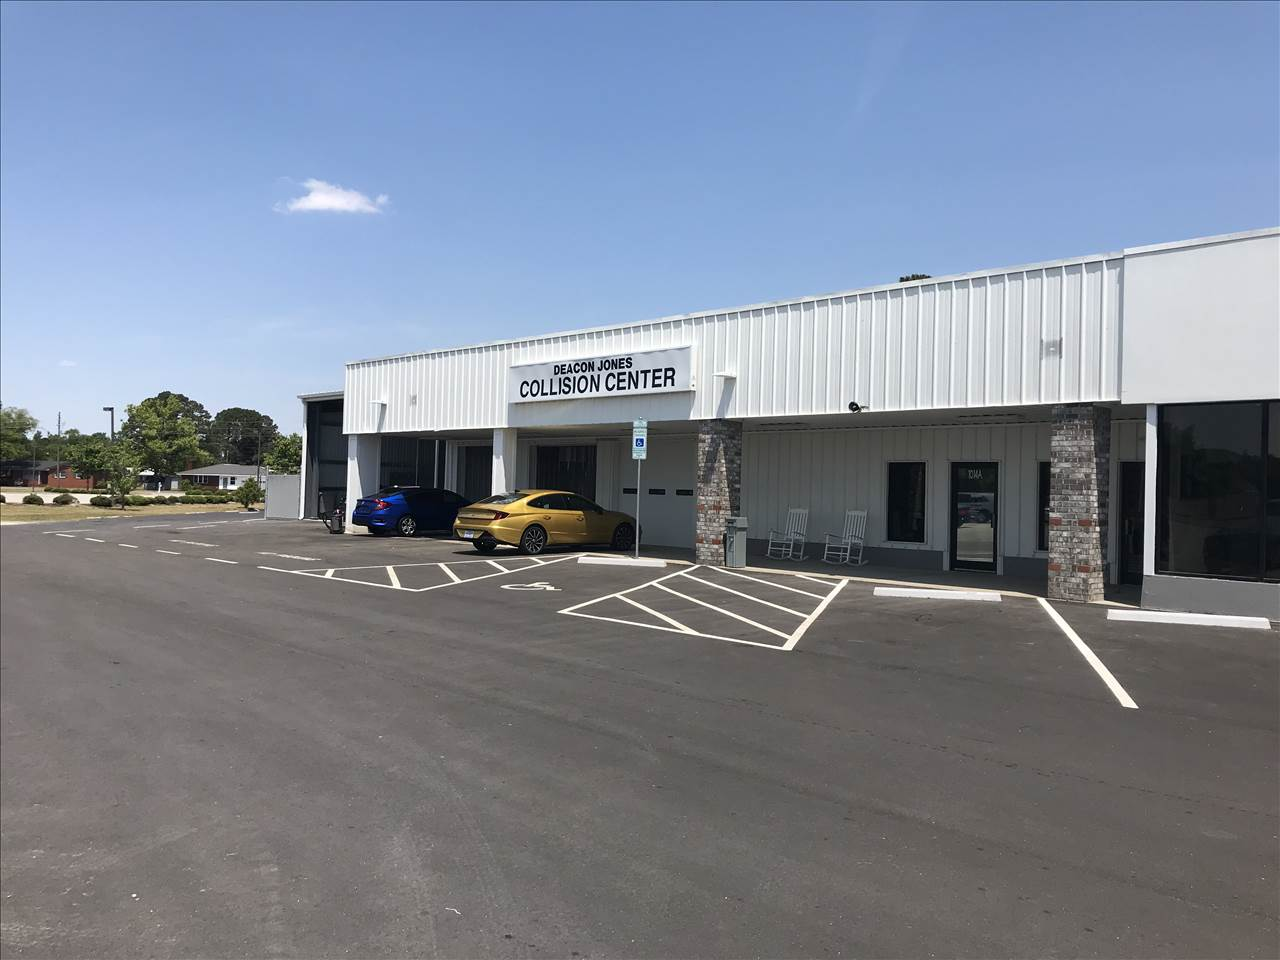 Deacon Jones Collision Center Goldsboro in Goldsboro, NC, 20 ...